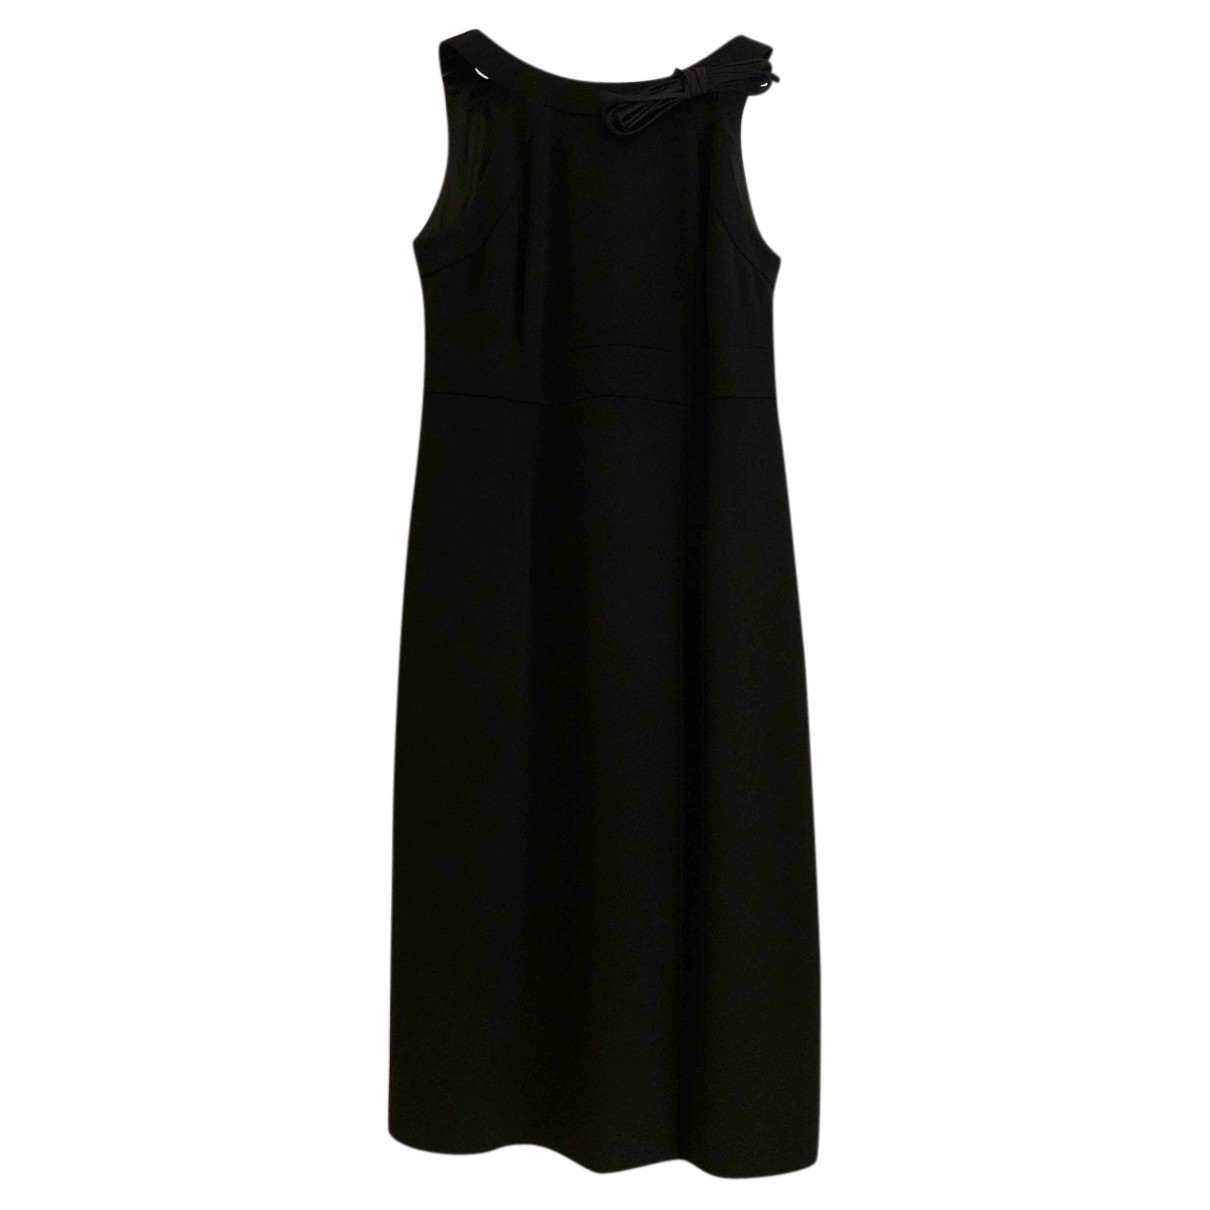 Max Mara N Black dress for Women 8 UK